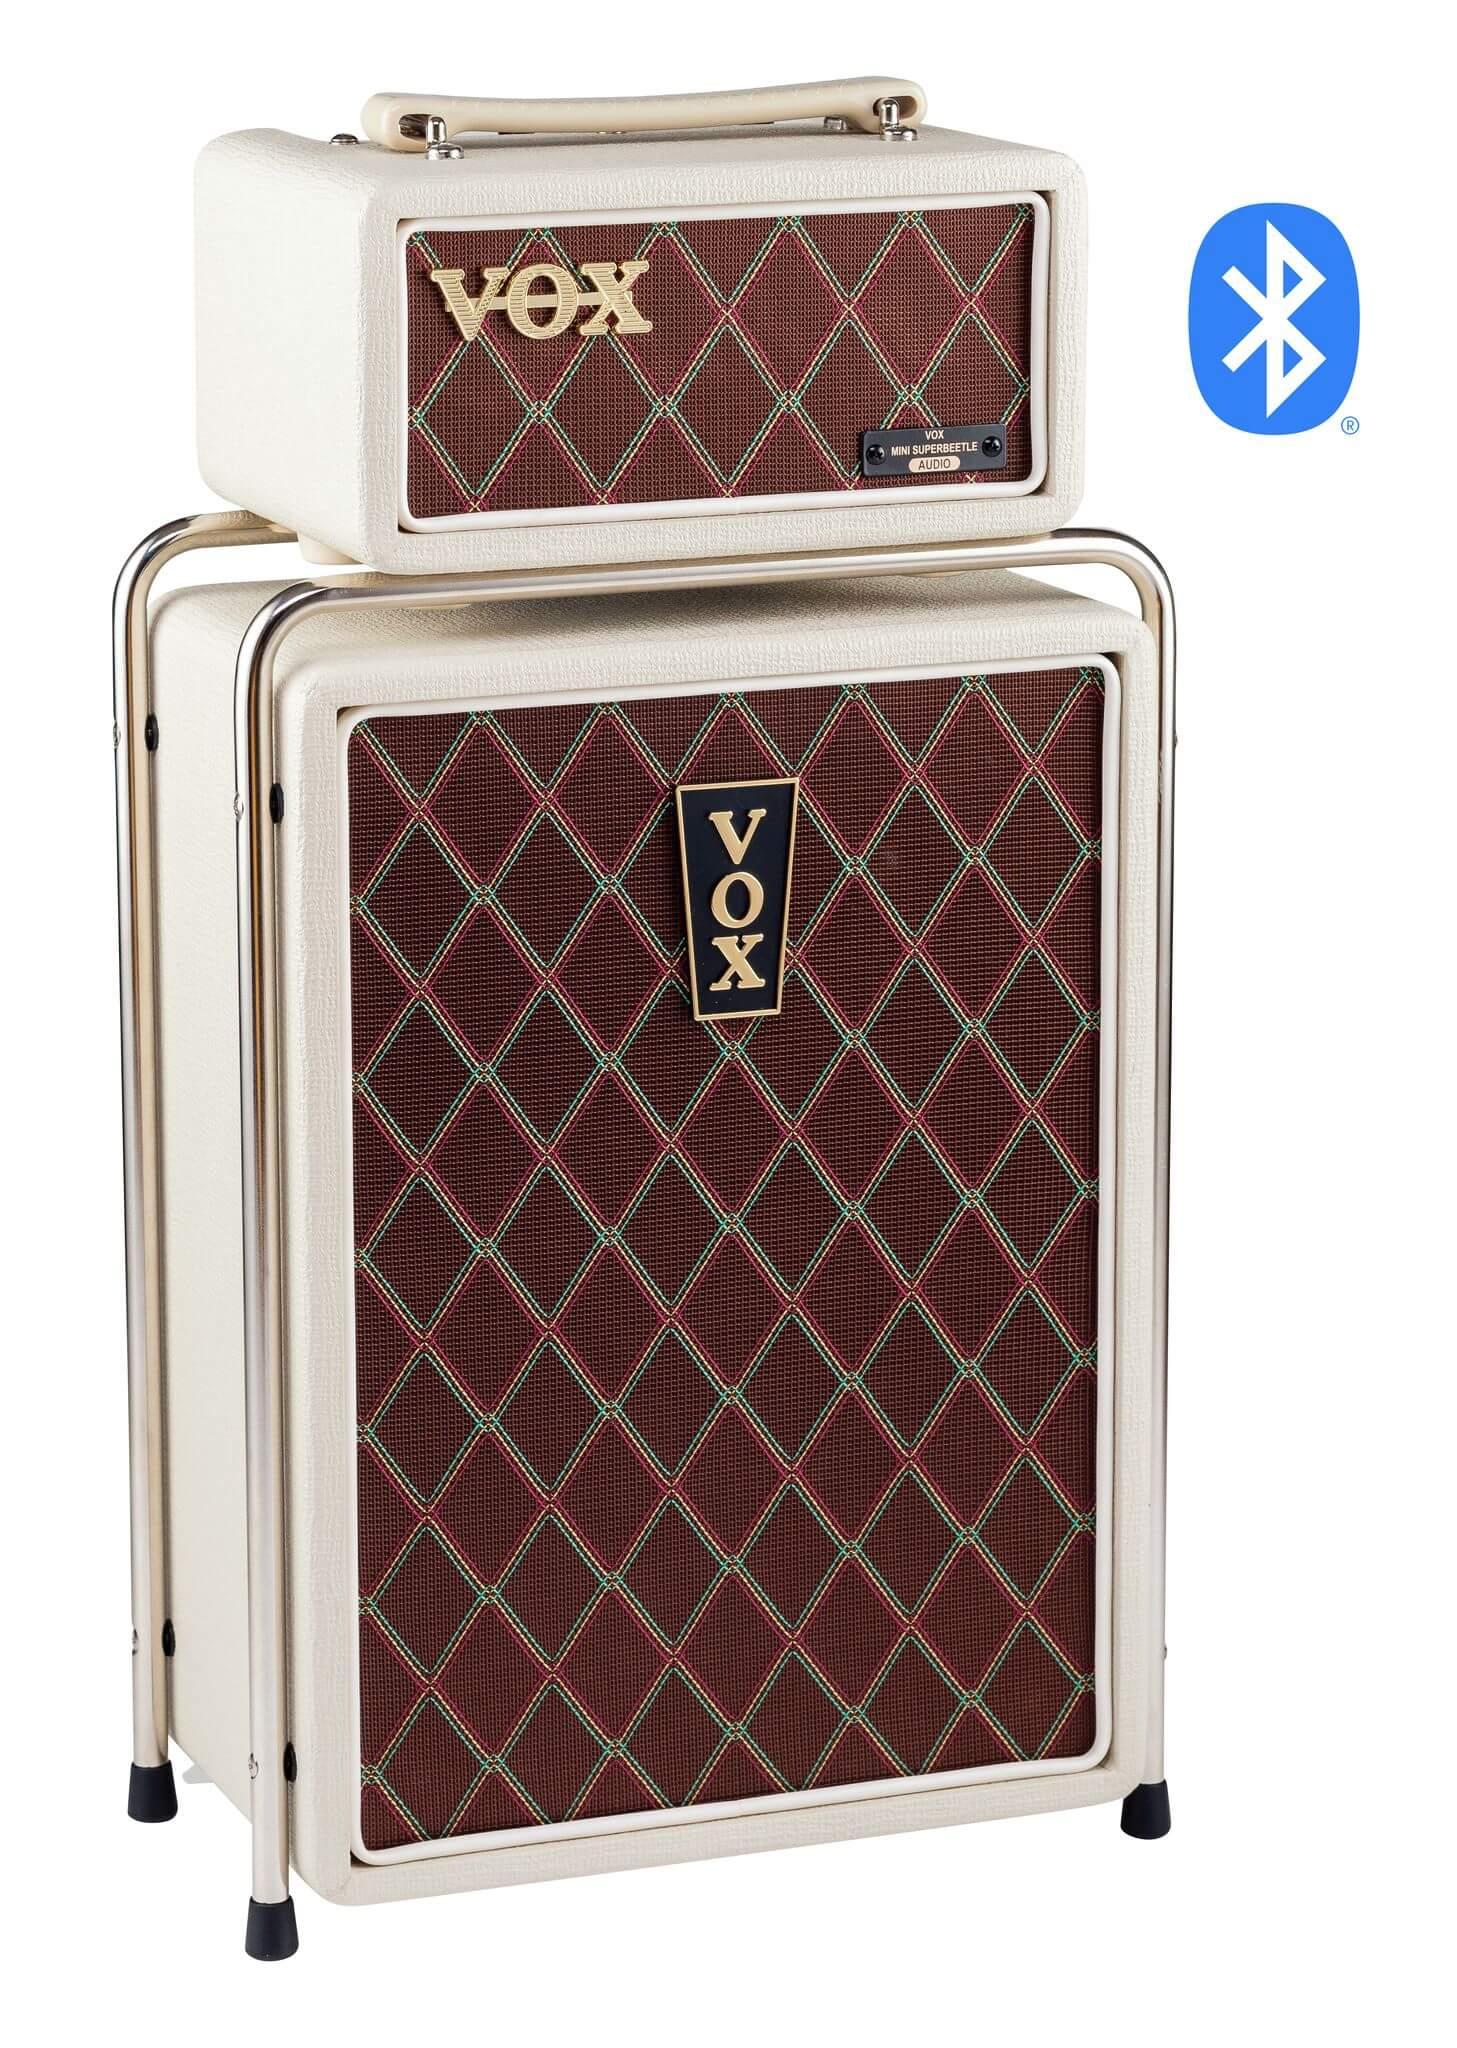 VOX MSB50-AUDIO-IV Bluetooth speaker, Ivory